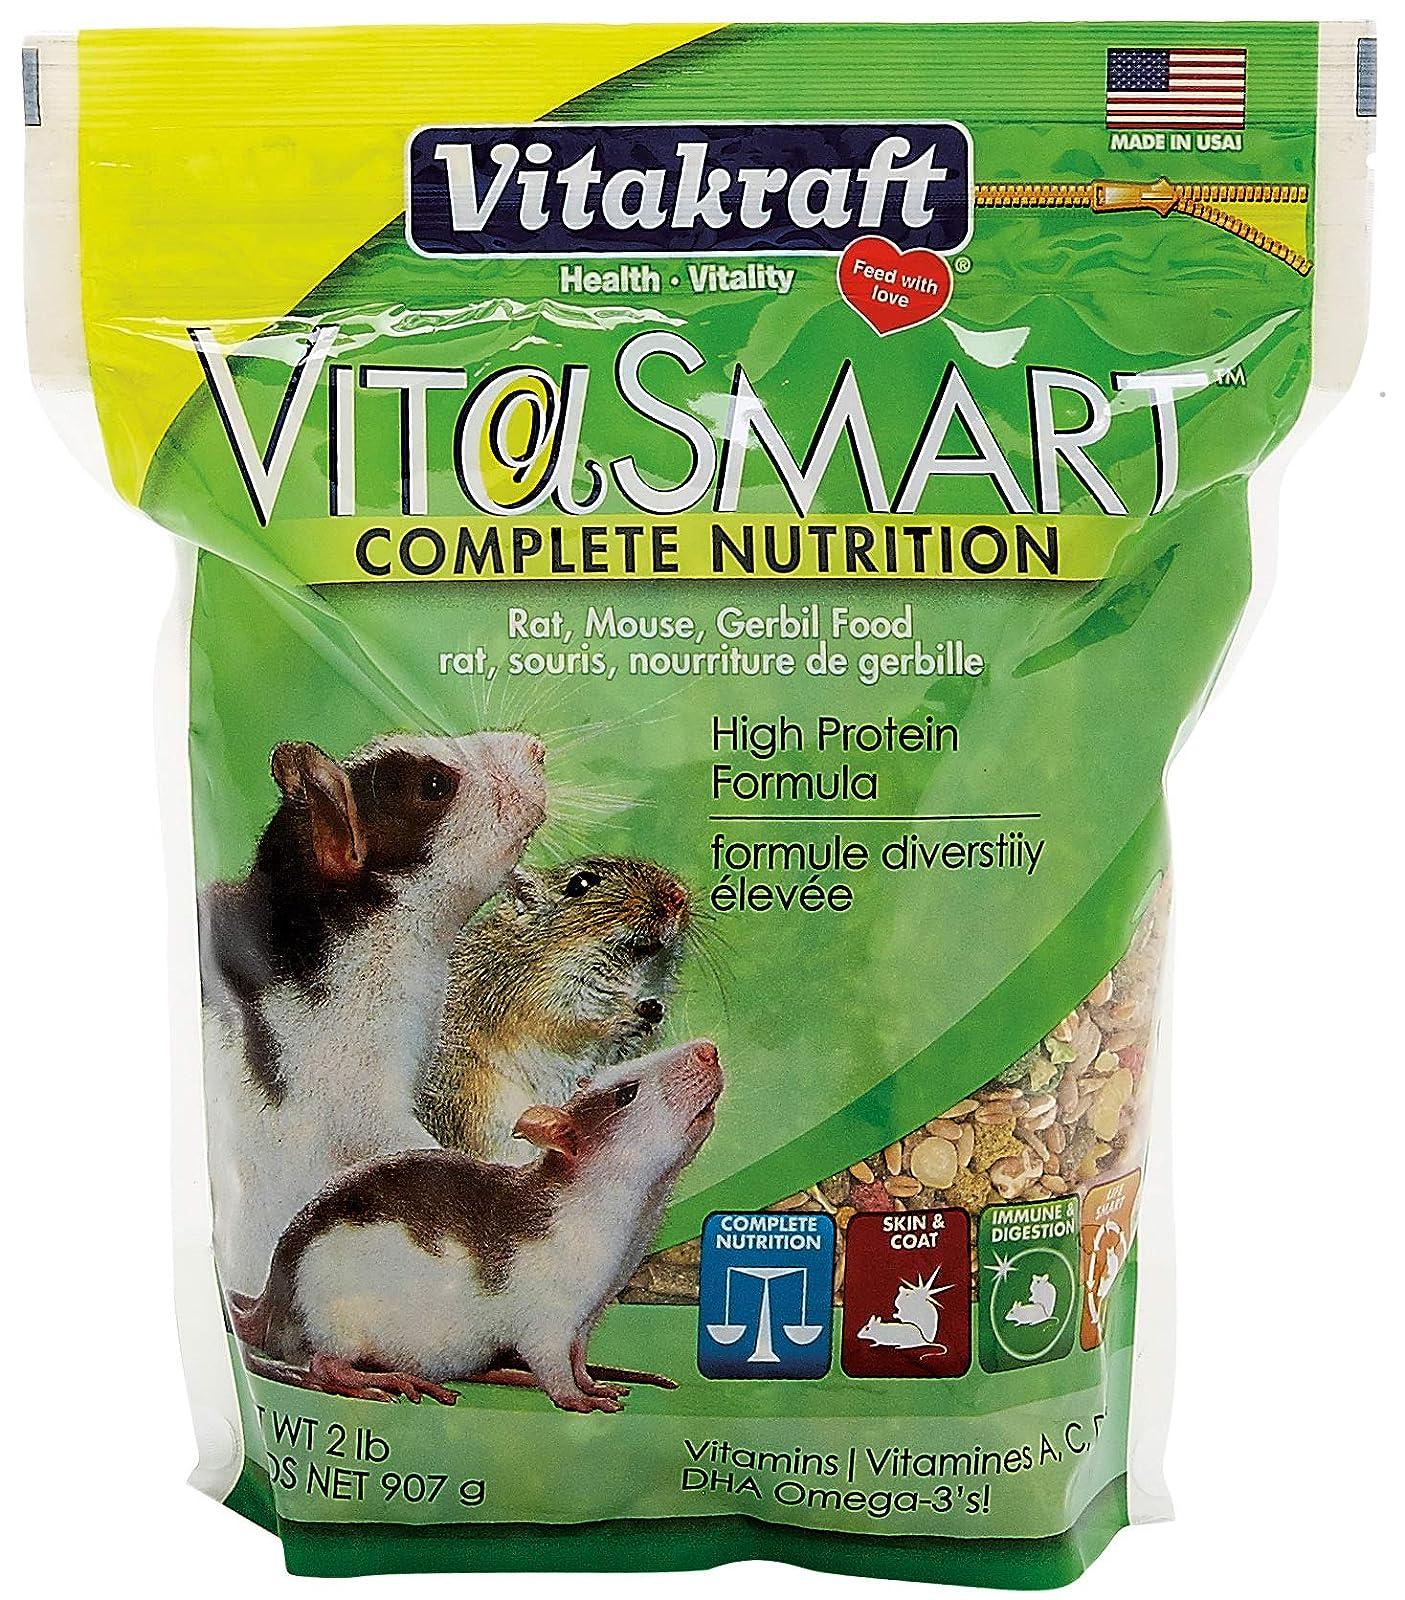 Vitakraft Vita Smart Rat/Mouse Food 2 Lb Bag 34515 SMALLPET - 1